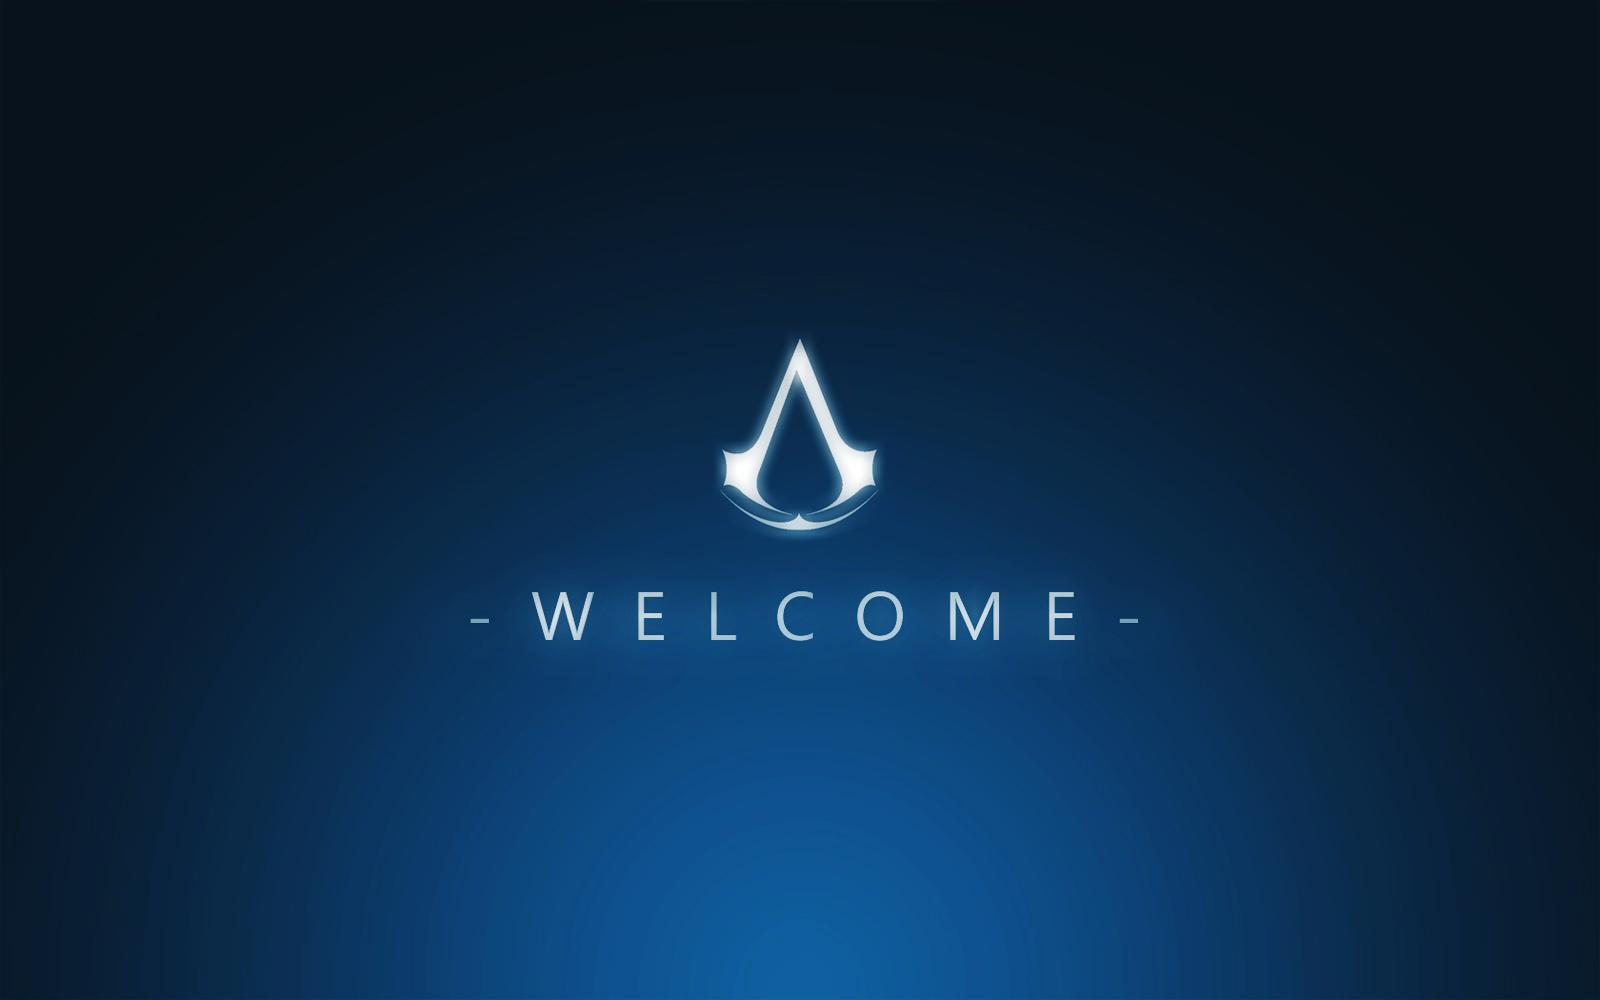 http://4.bp.blogspot.com/-KVTJkolQoQM/Too8RdR2KWI/AAAAAAAADVk/tKQfh6kvH-s/s1600/Assassin\'s_Creed_Logo_Blue_HD_Wallpaper_GameWallBase.com.jpg.jpg